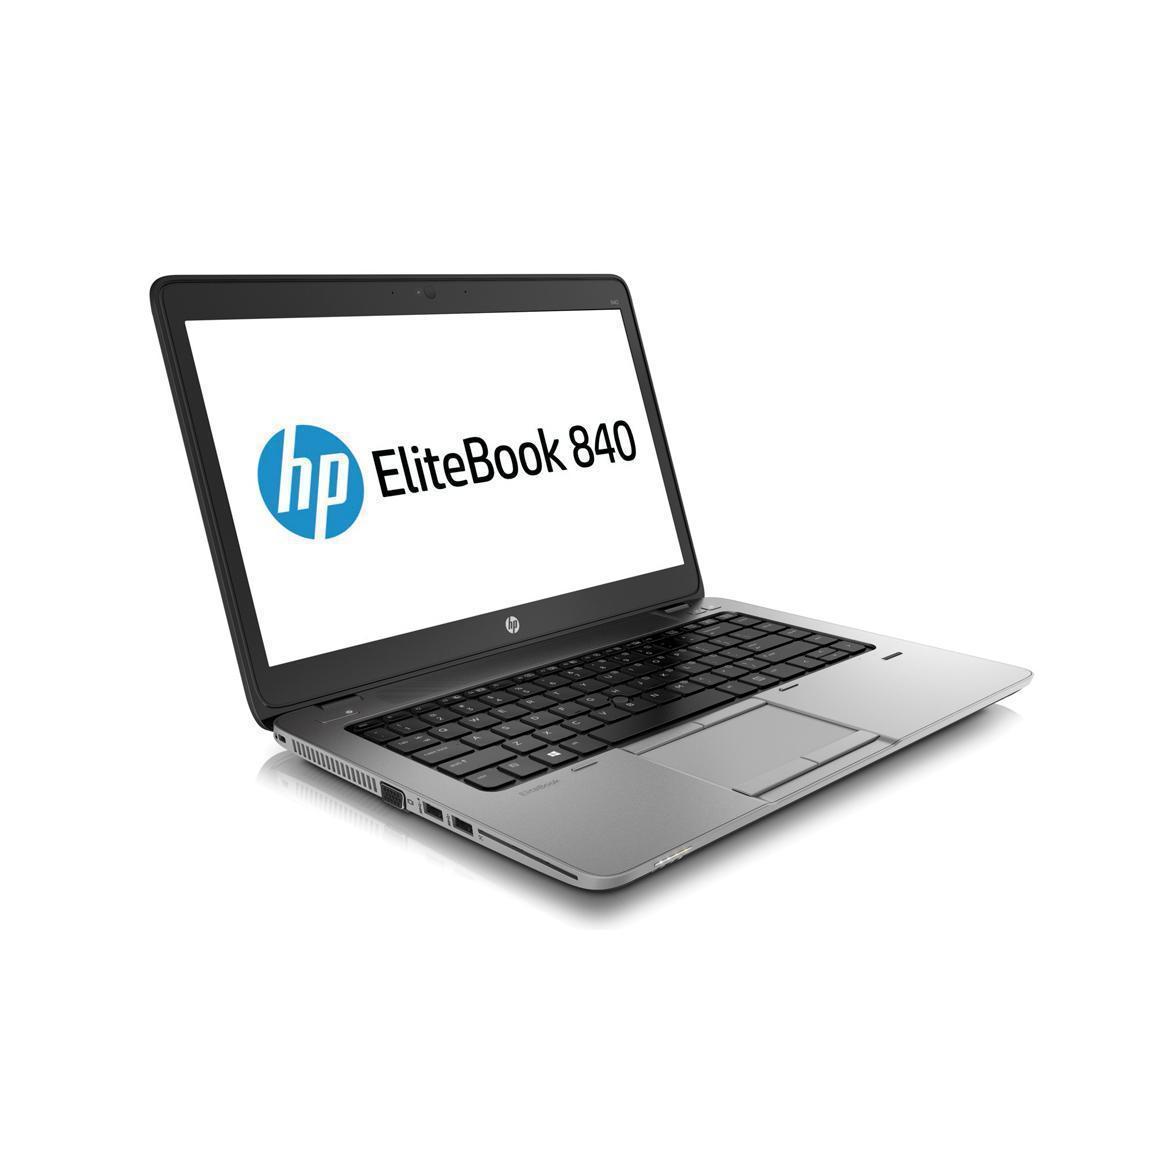 Hp Elitebook 840 G1 14-inch (April 2014) - Core i5-4300U - 16 GB  - HDD 500 GB